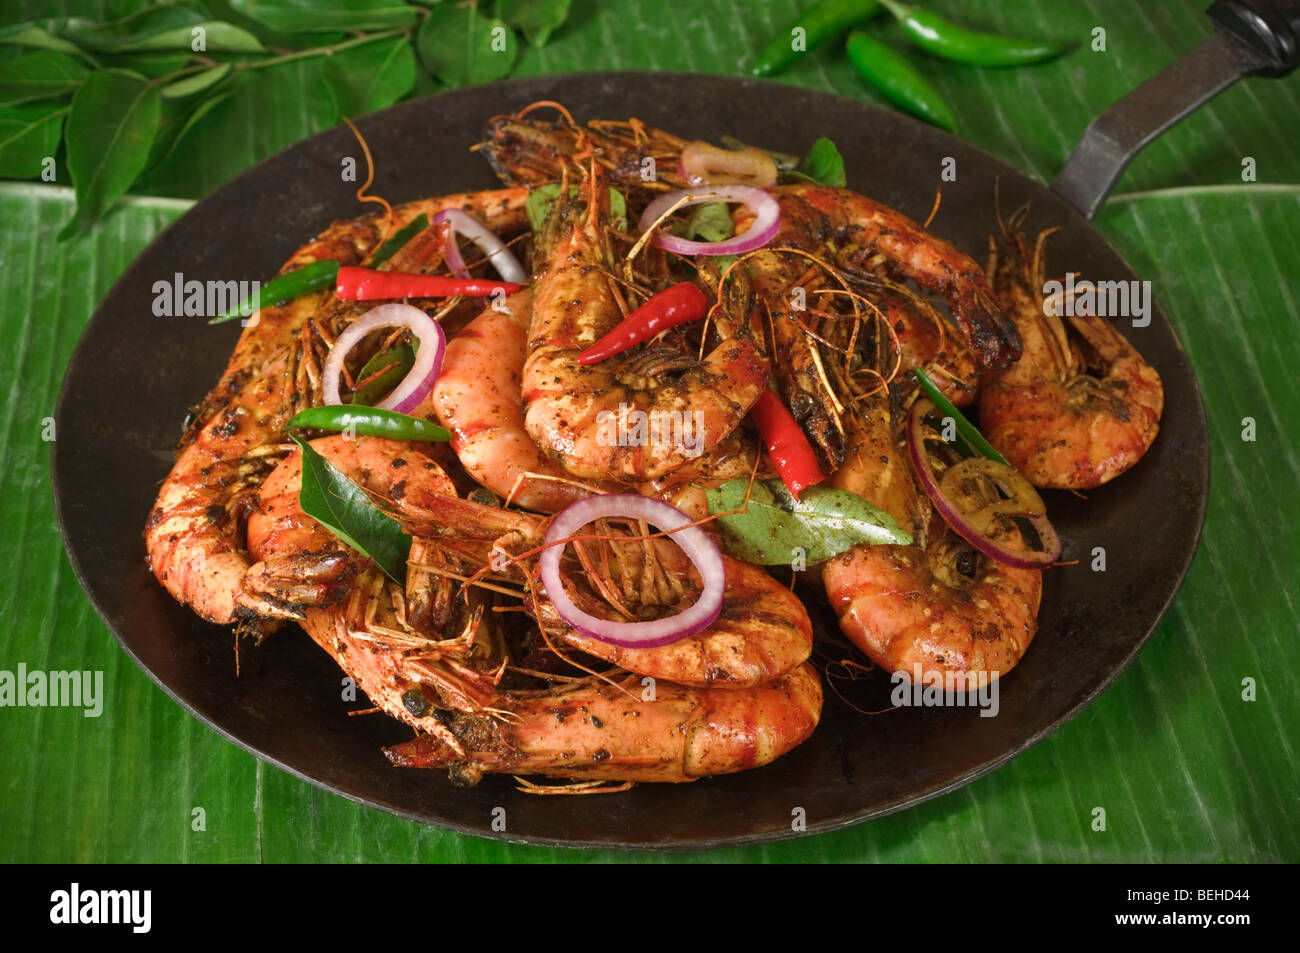 Shrimp Or Prawns Fry South India Food Stock Photo 26199044 Alamy